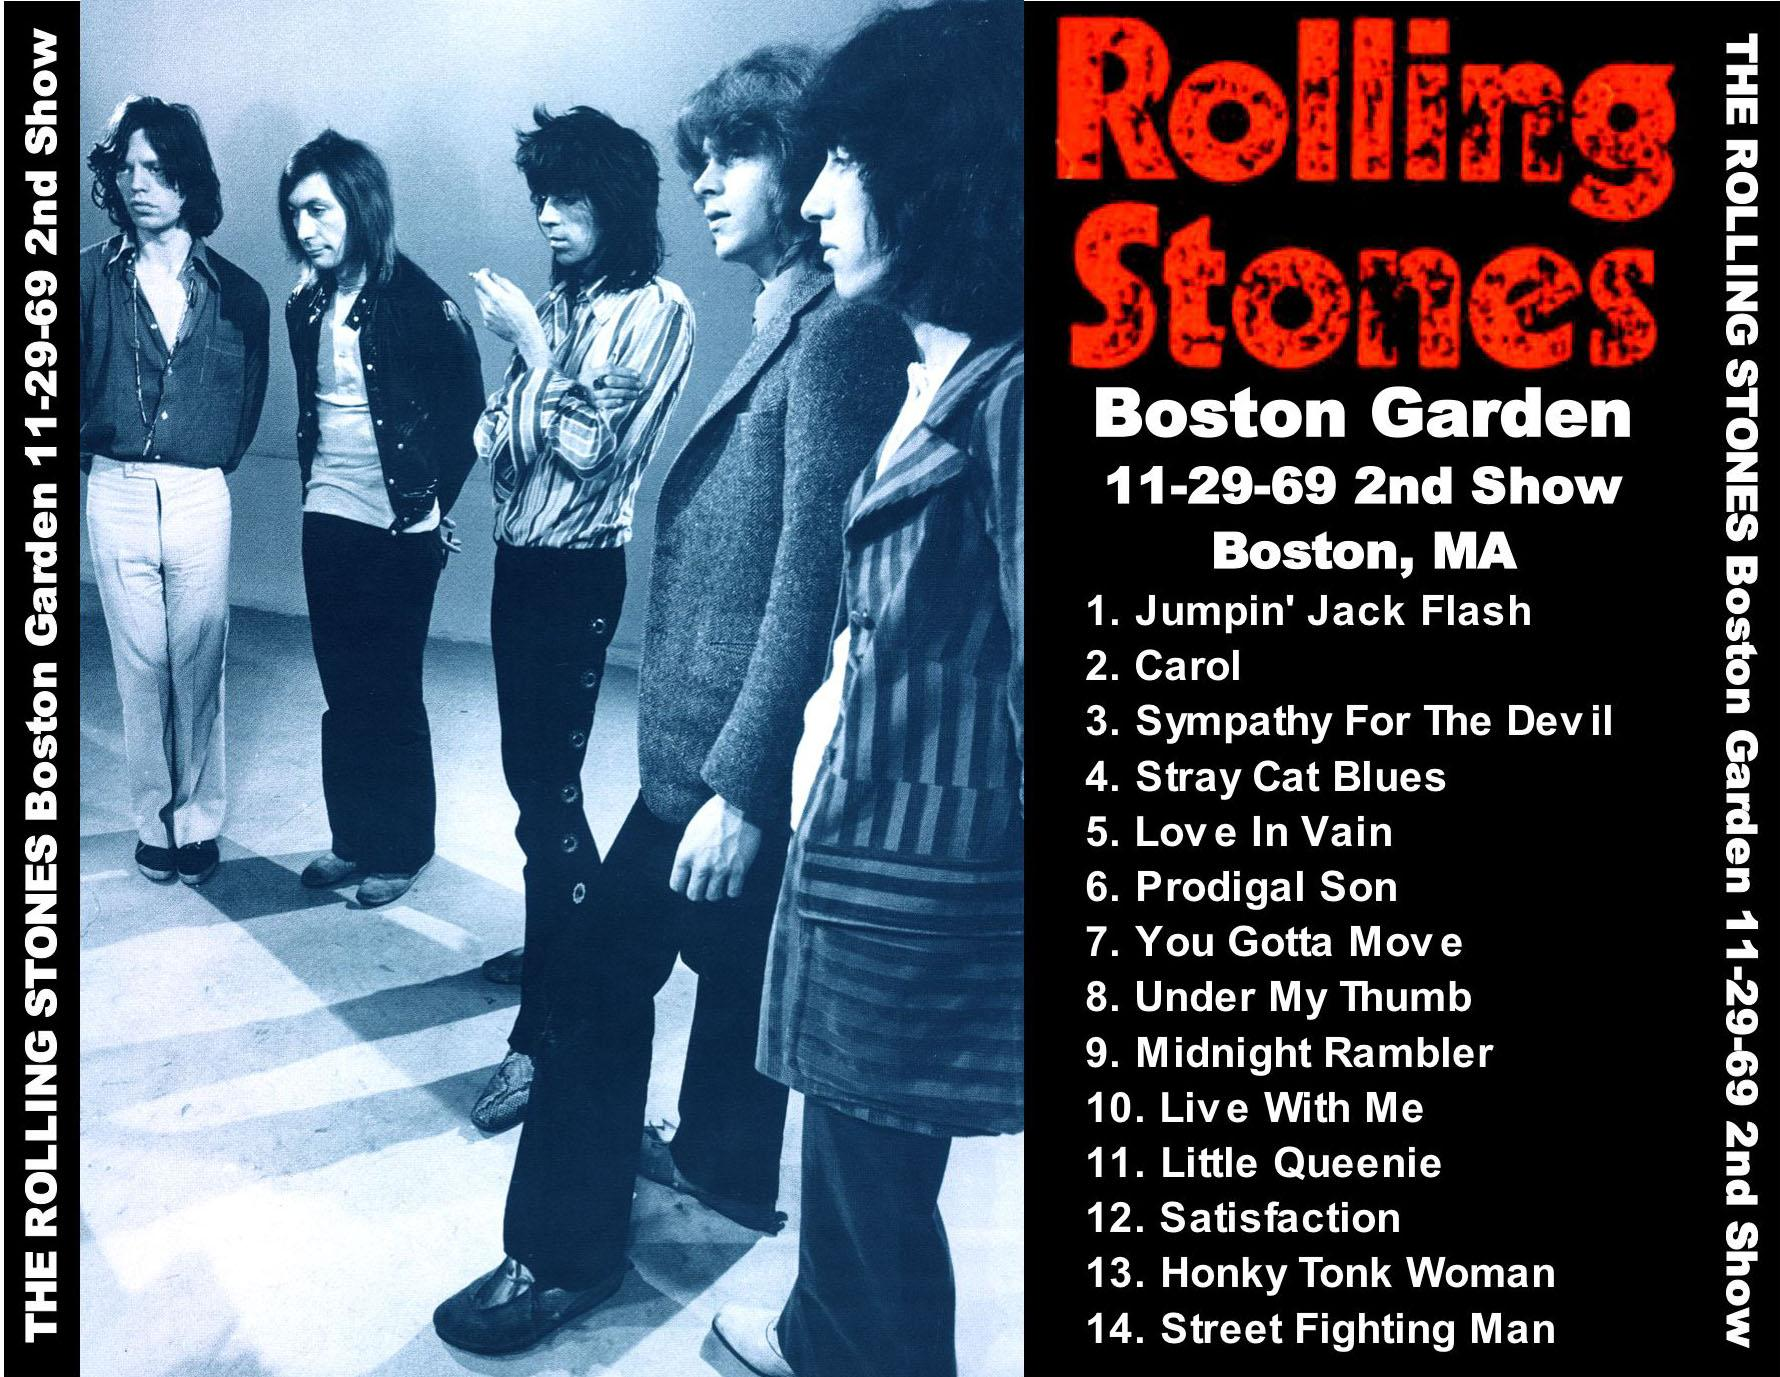 Rolling Stones - Boston Gardens - Boston, Mass  - November